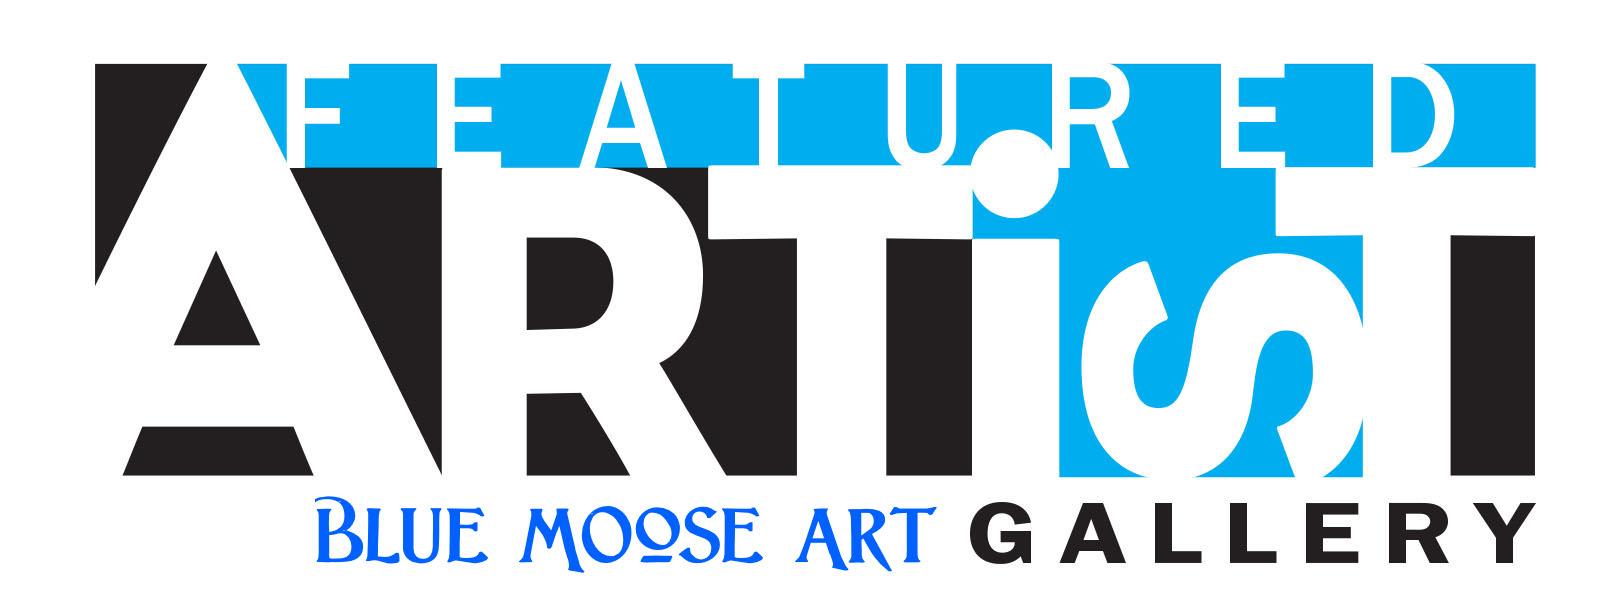 Featured-Artist-Gallery-Logo-Option.jpg